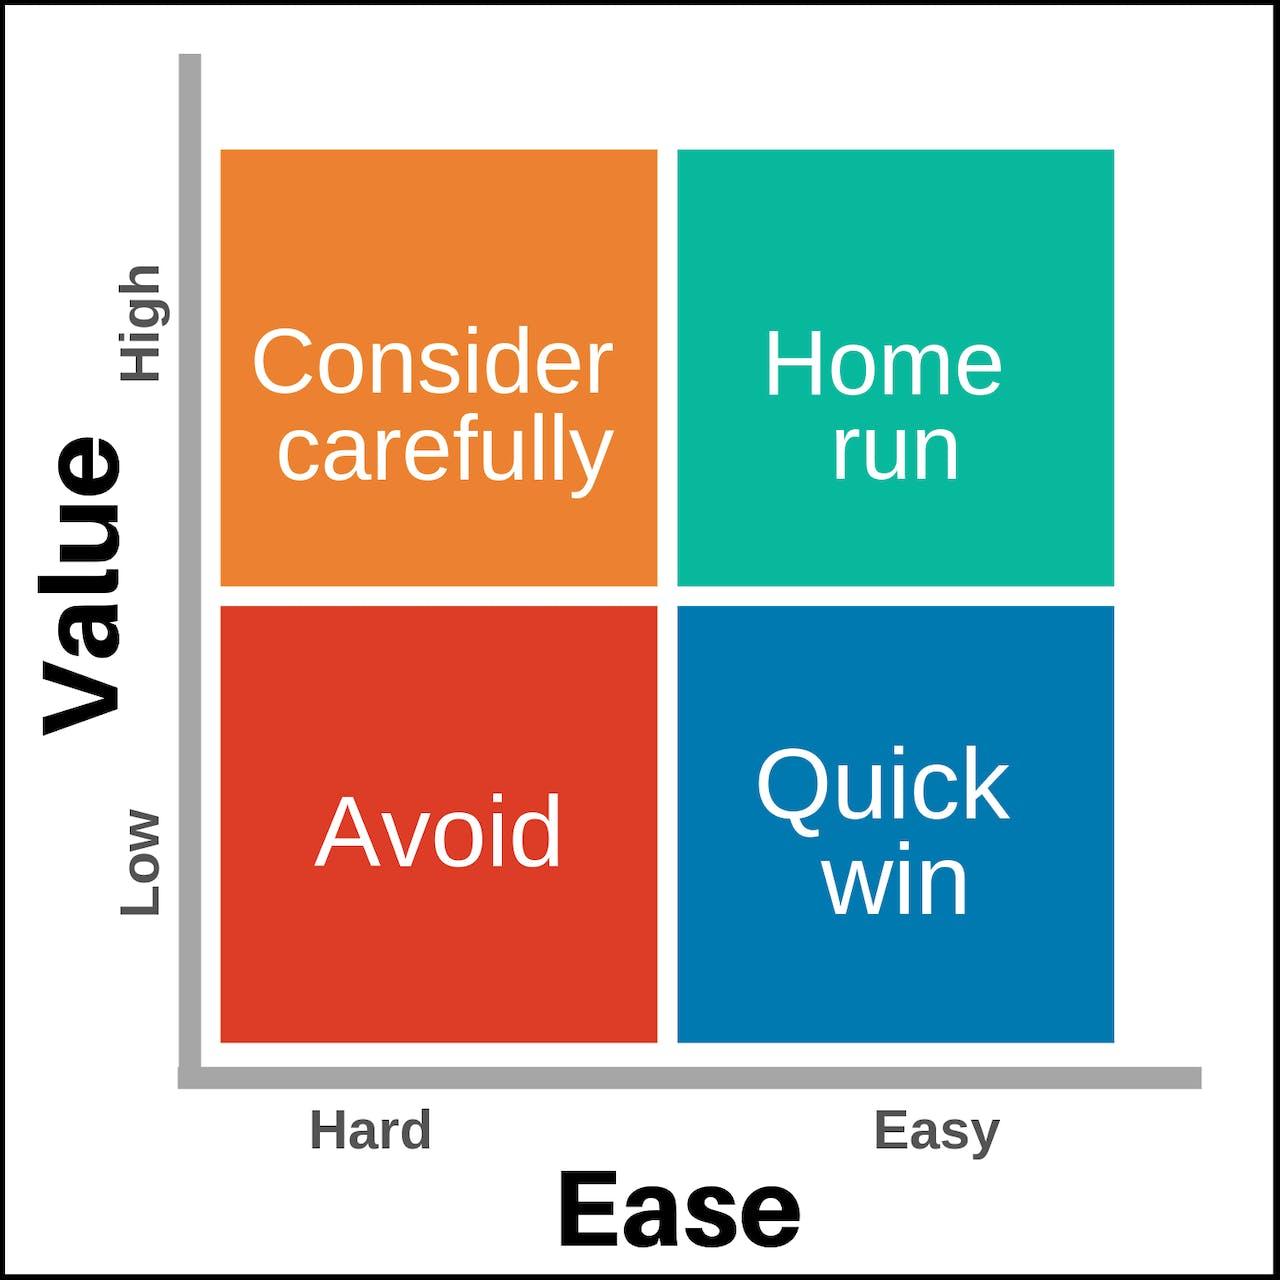 Value vs Ease grid